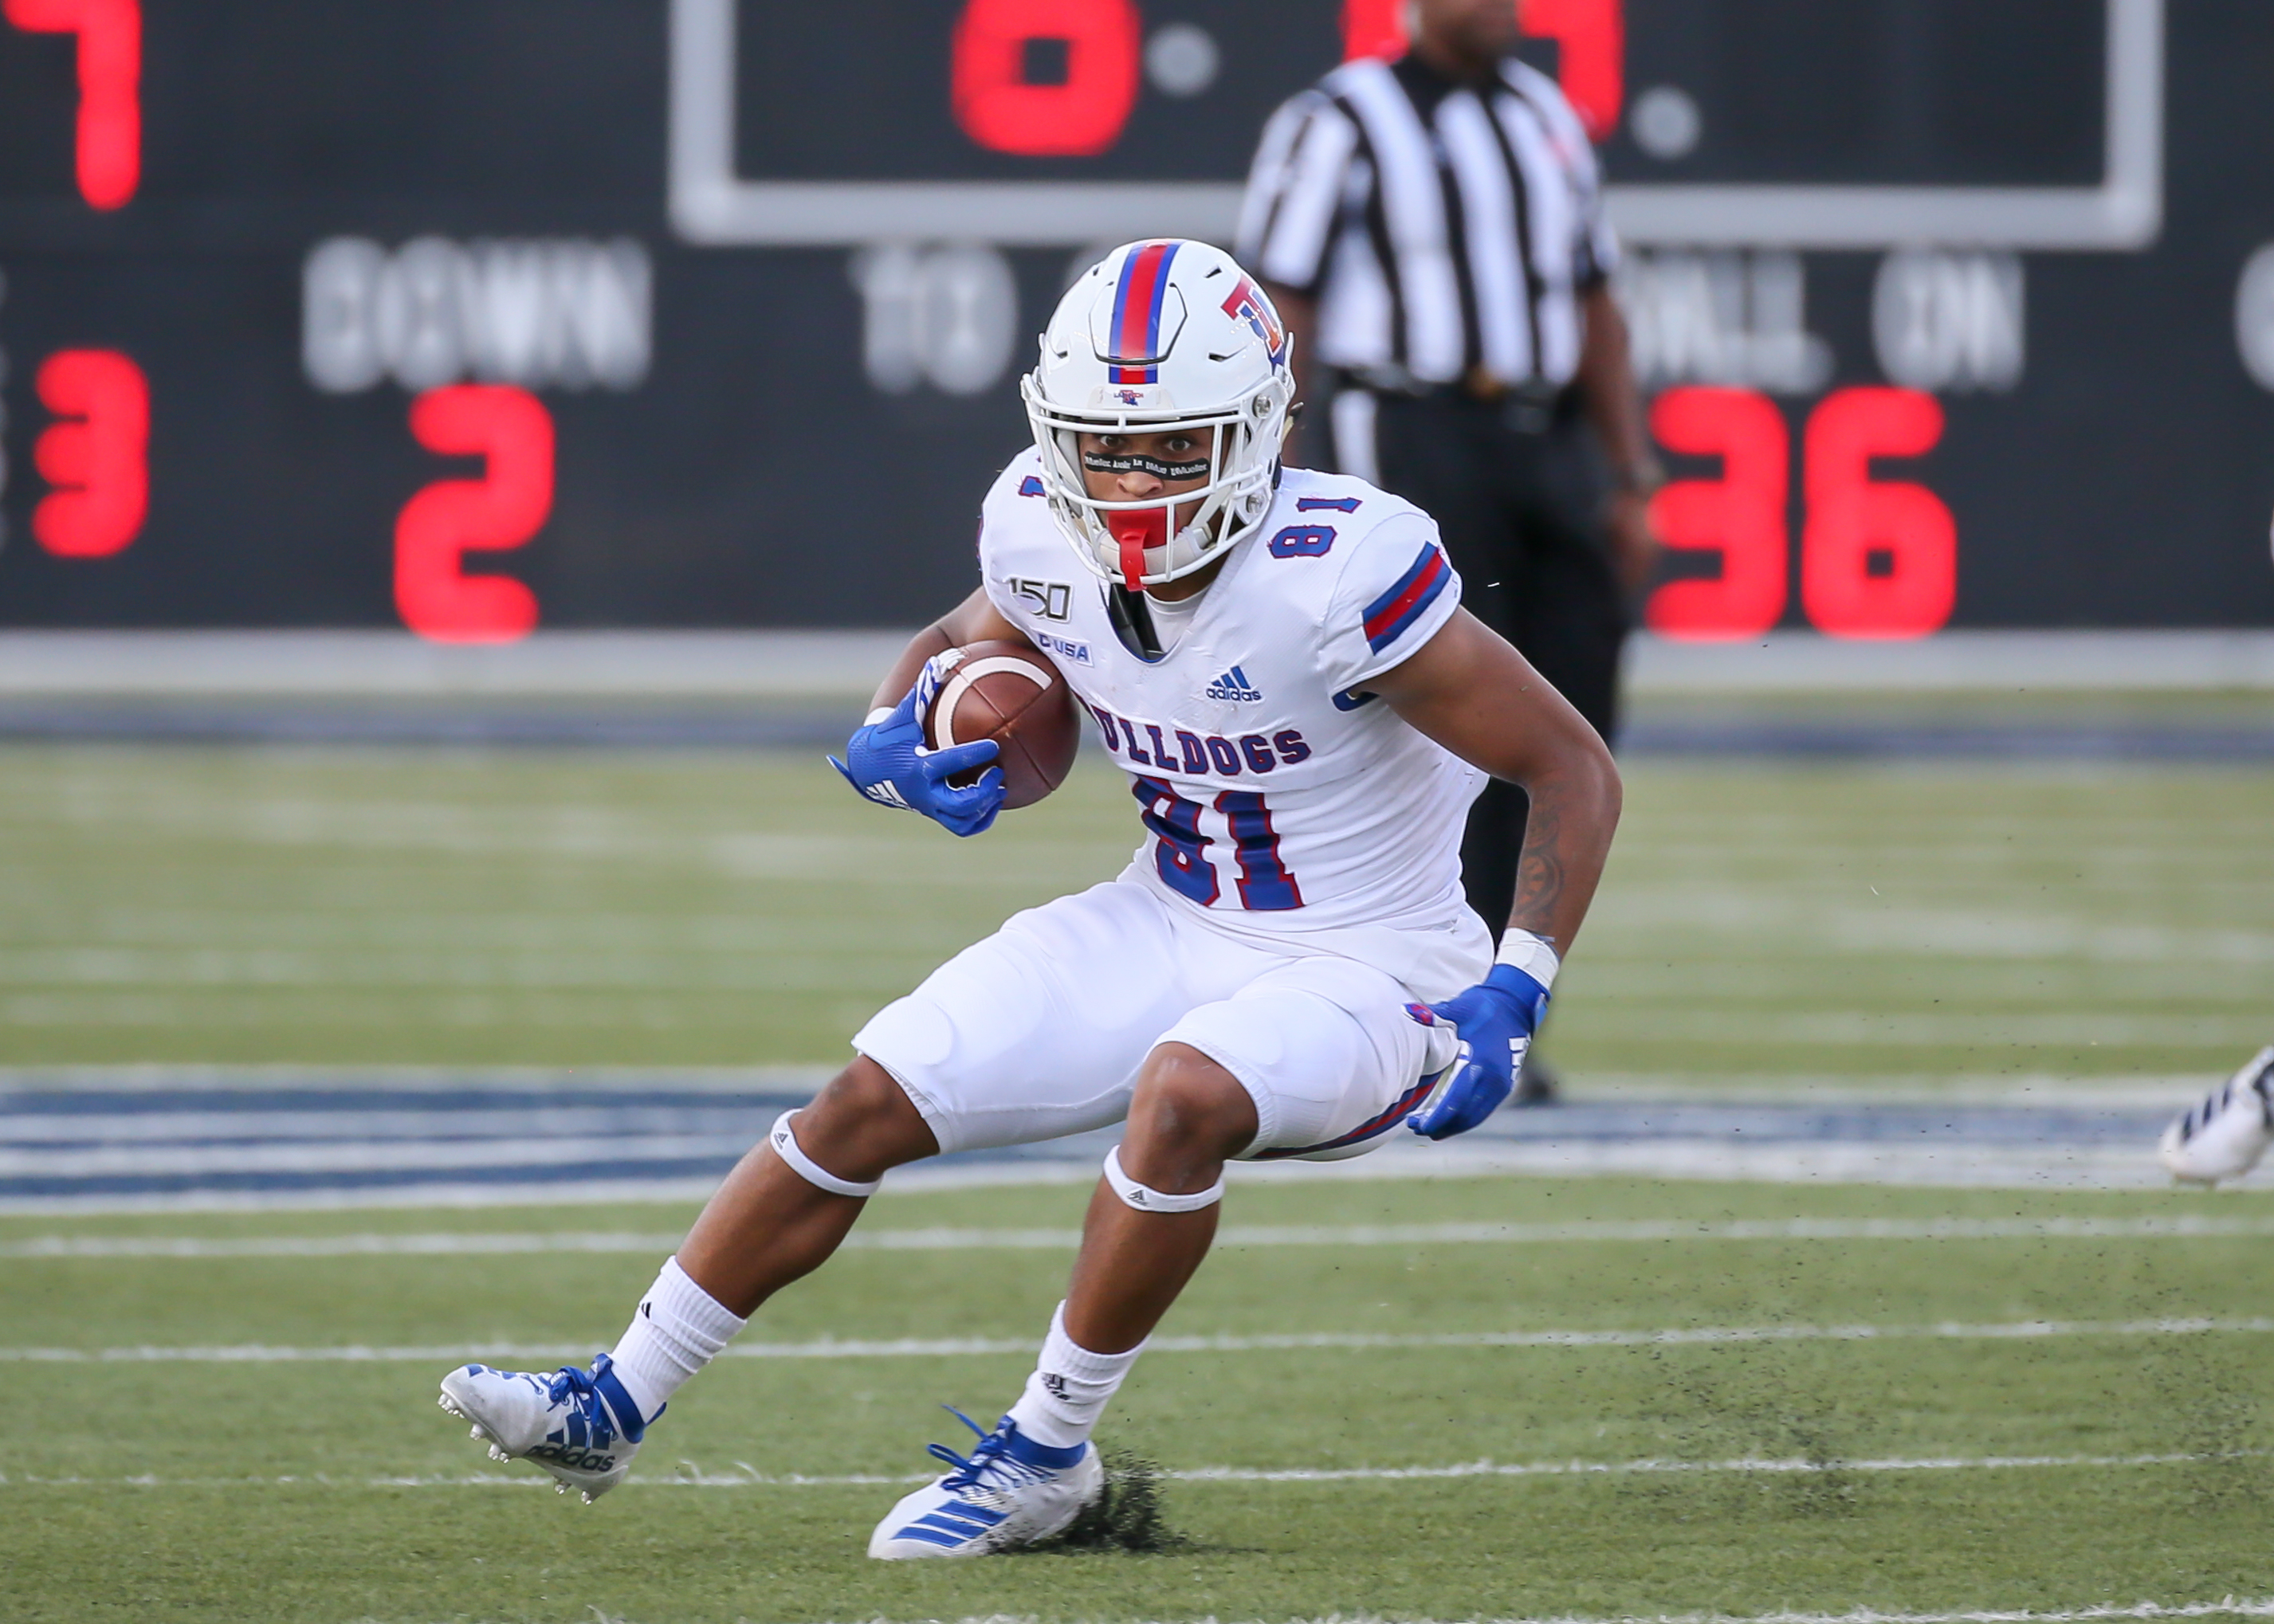 COLLEGE FOOTBALL: SEP 28 Louisiana Tech at Rice